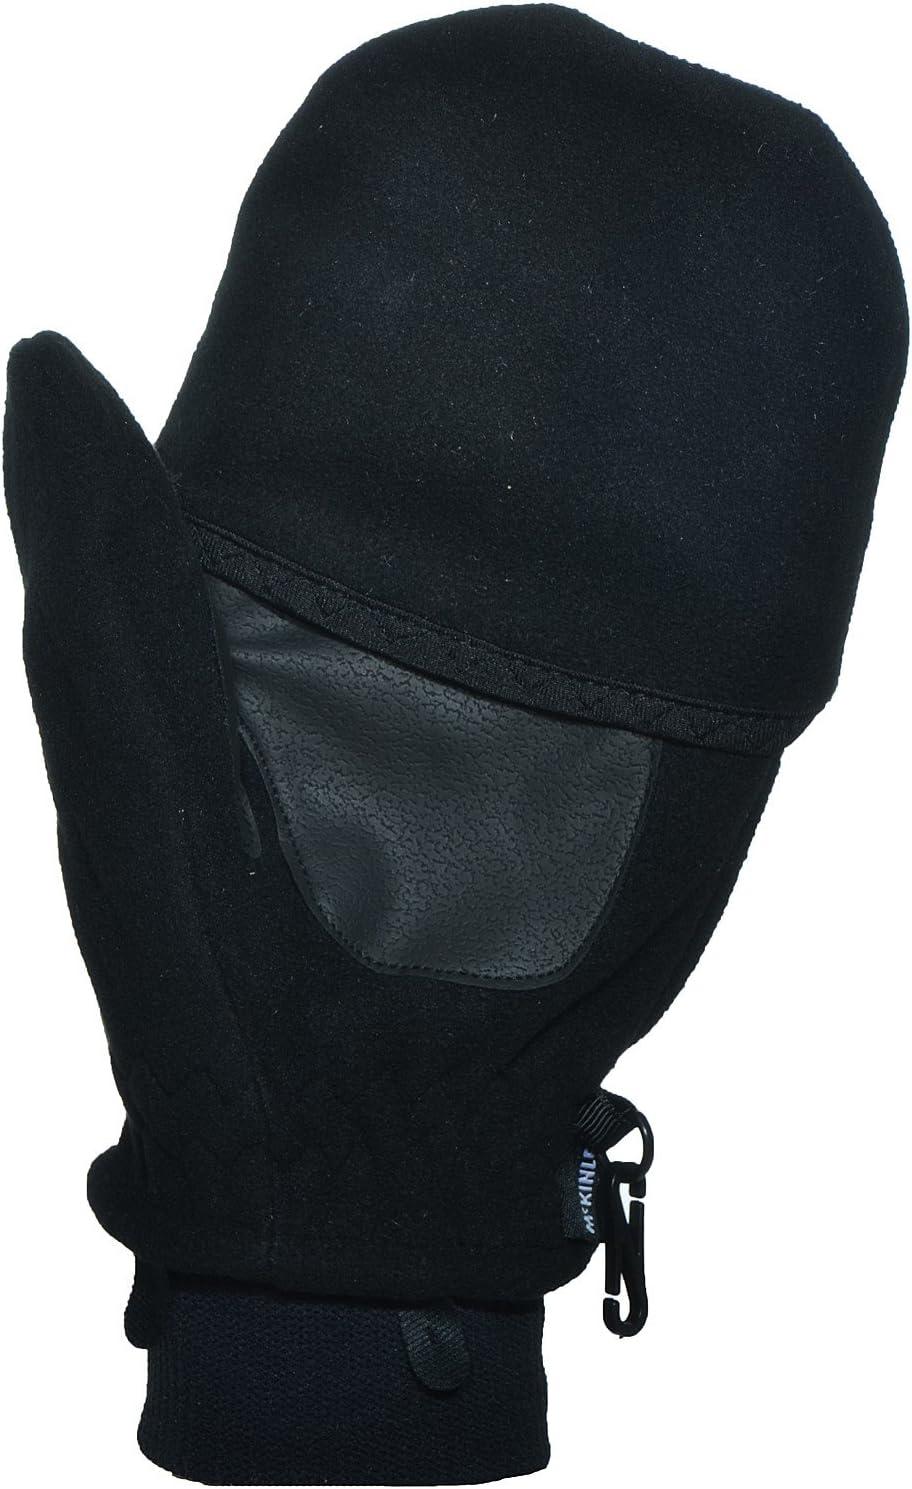 McKINLEY Mens New Crasilia Middle Gloves